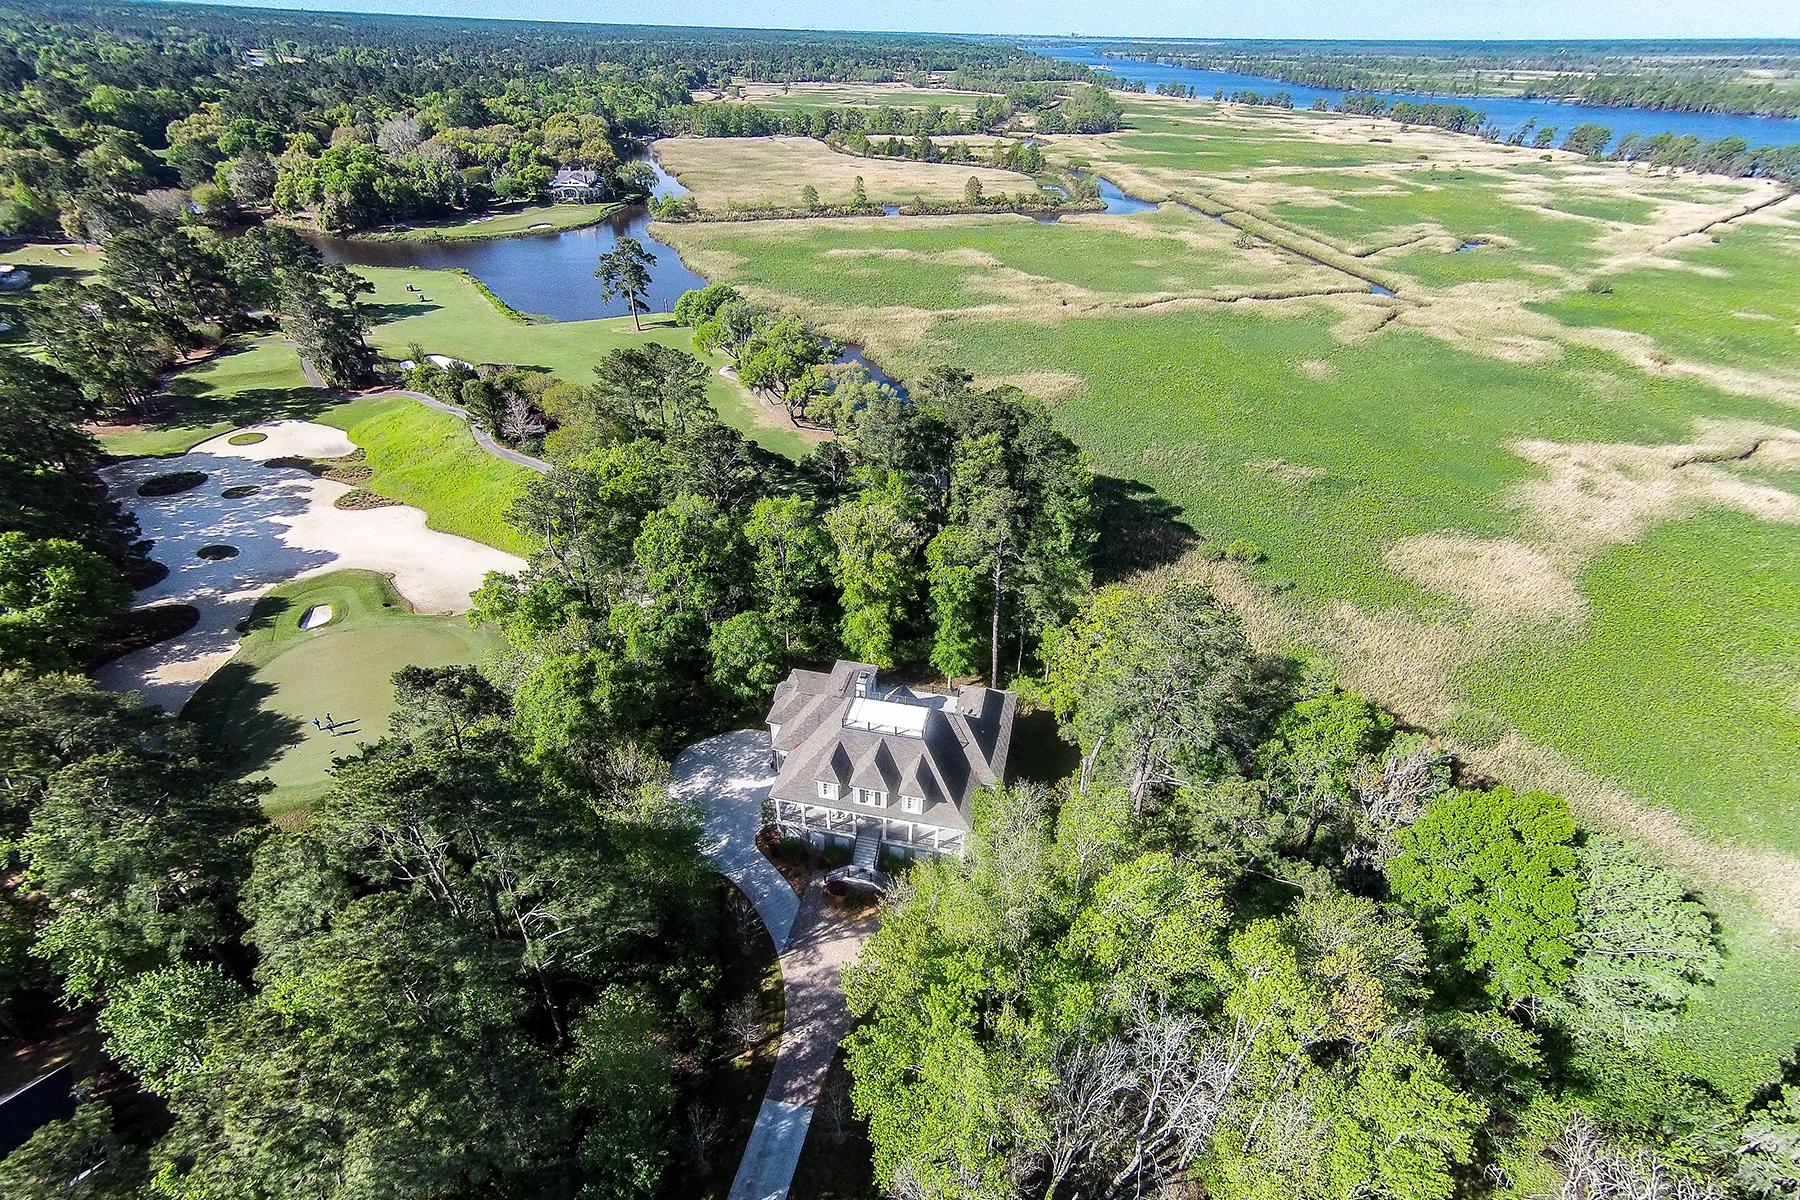 Villa per Vendita alle ore 171 Olde Canal Loop Pawleys Island, Carolina Del Sud, 29585 Stati Uniti